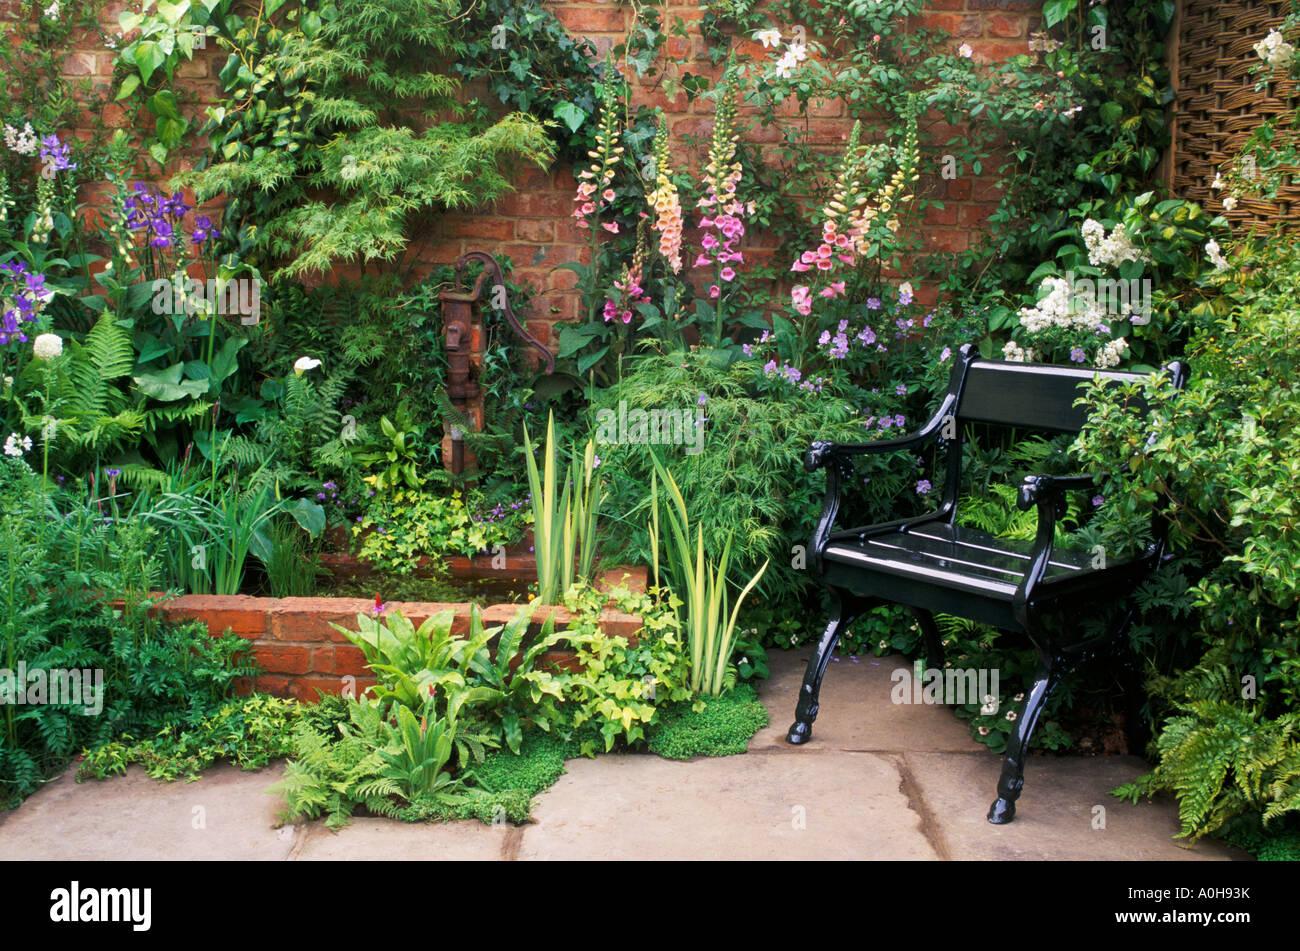 Raised Brick Pond In Small Walled Garden Design Roger